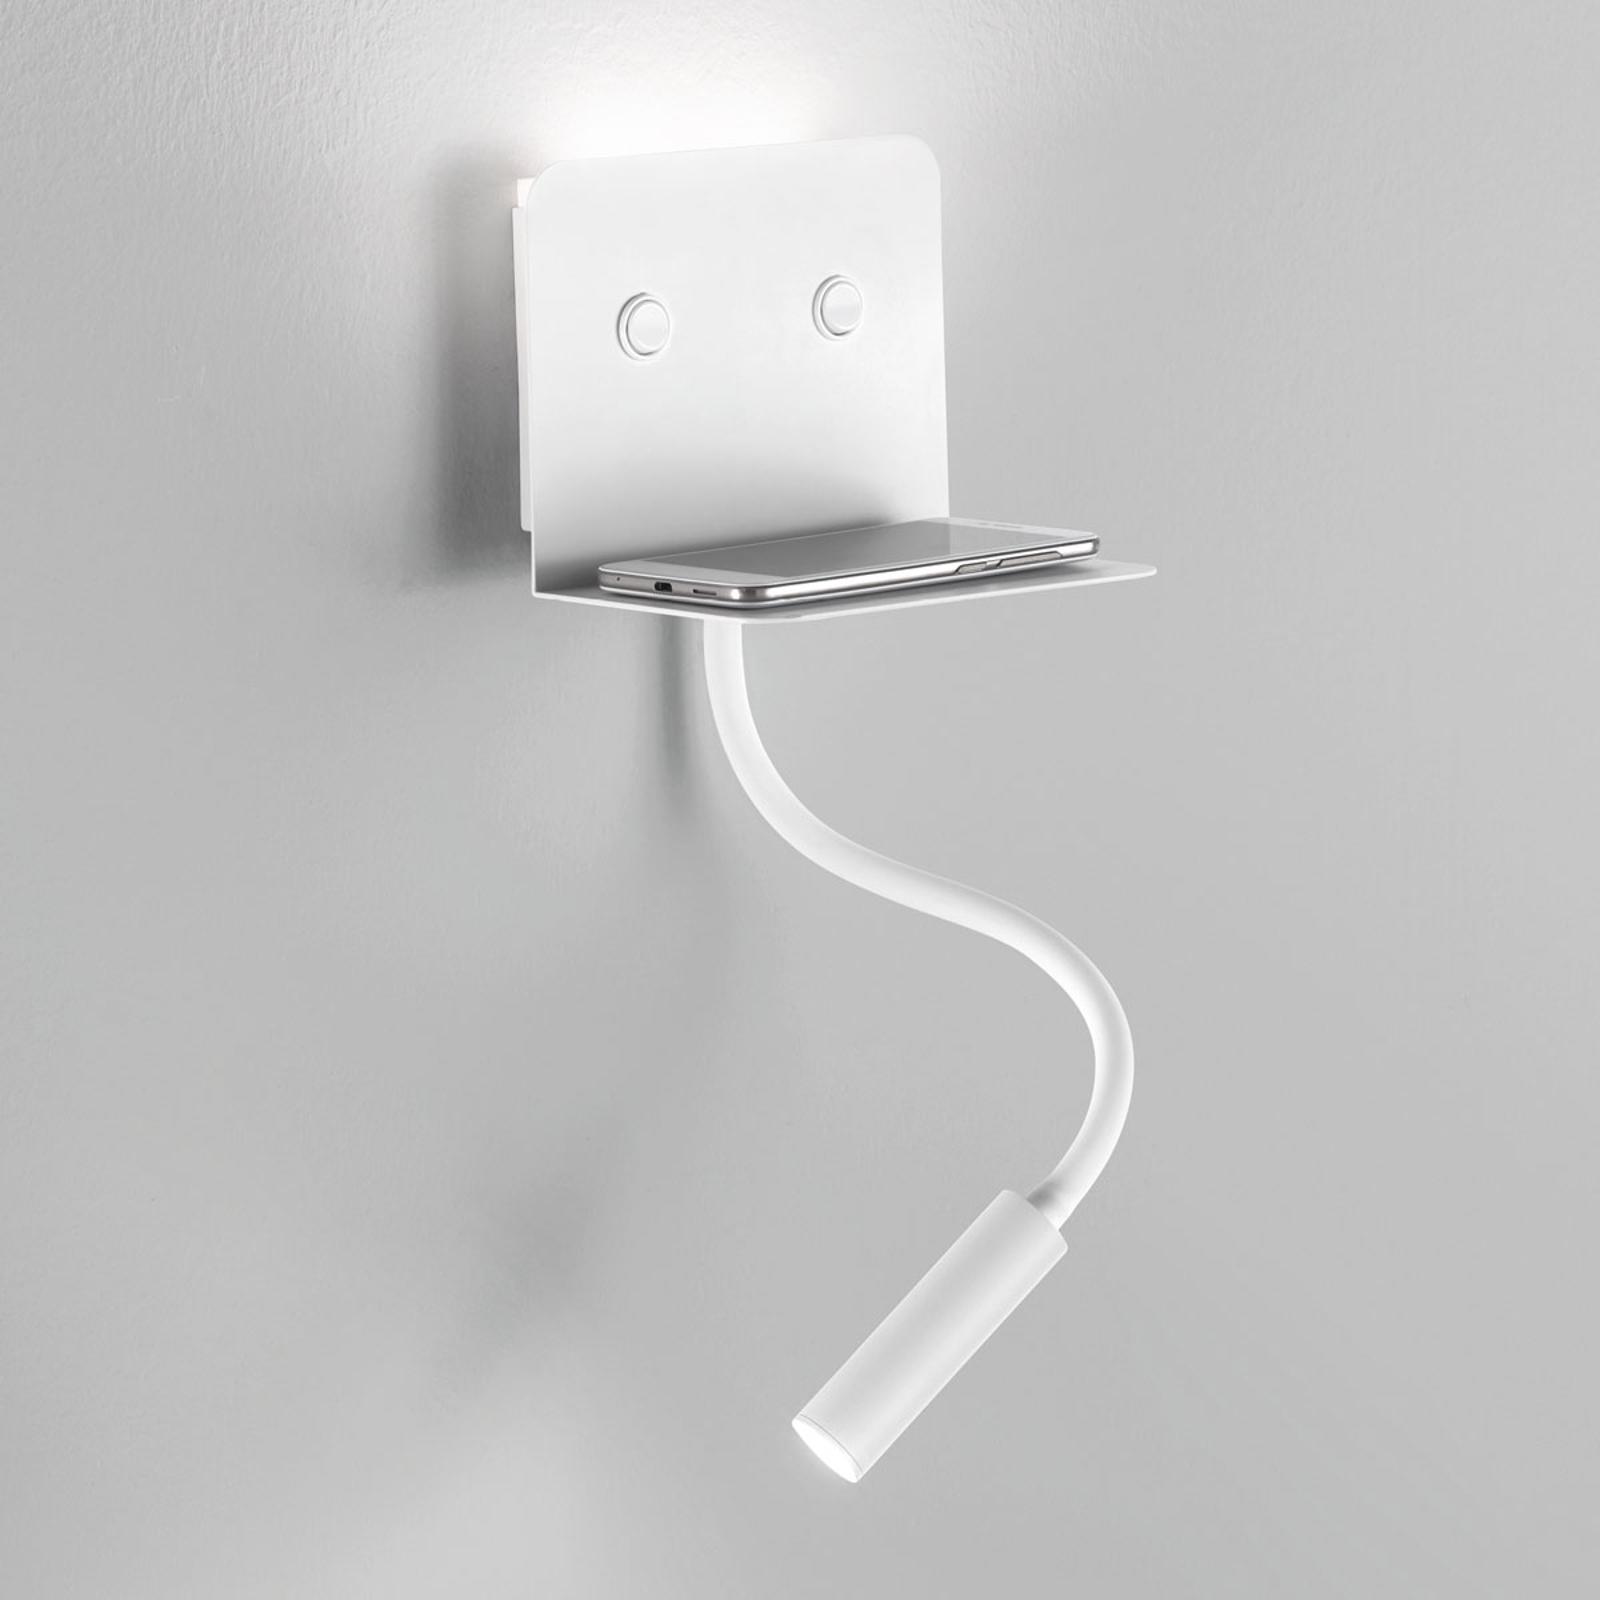 LED wandlamp Level met opbergvak en leeslamp